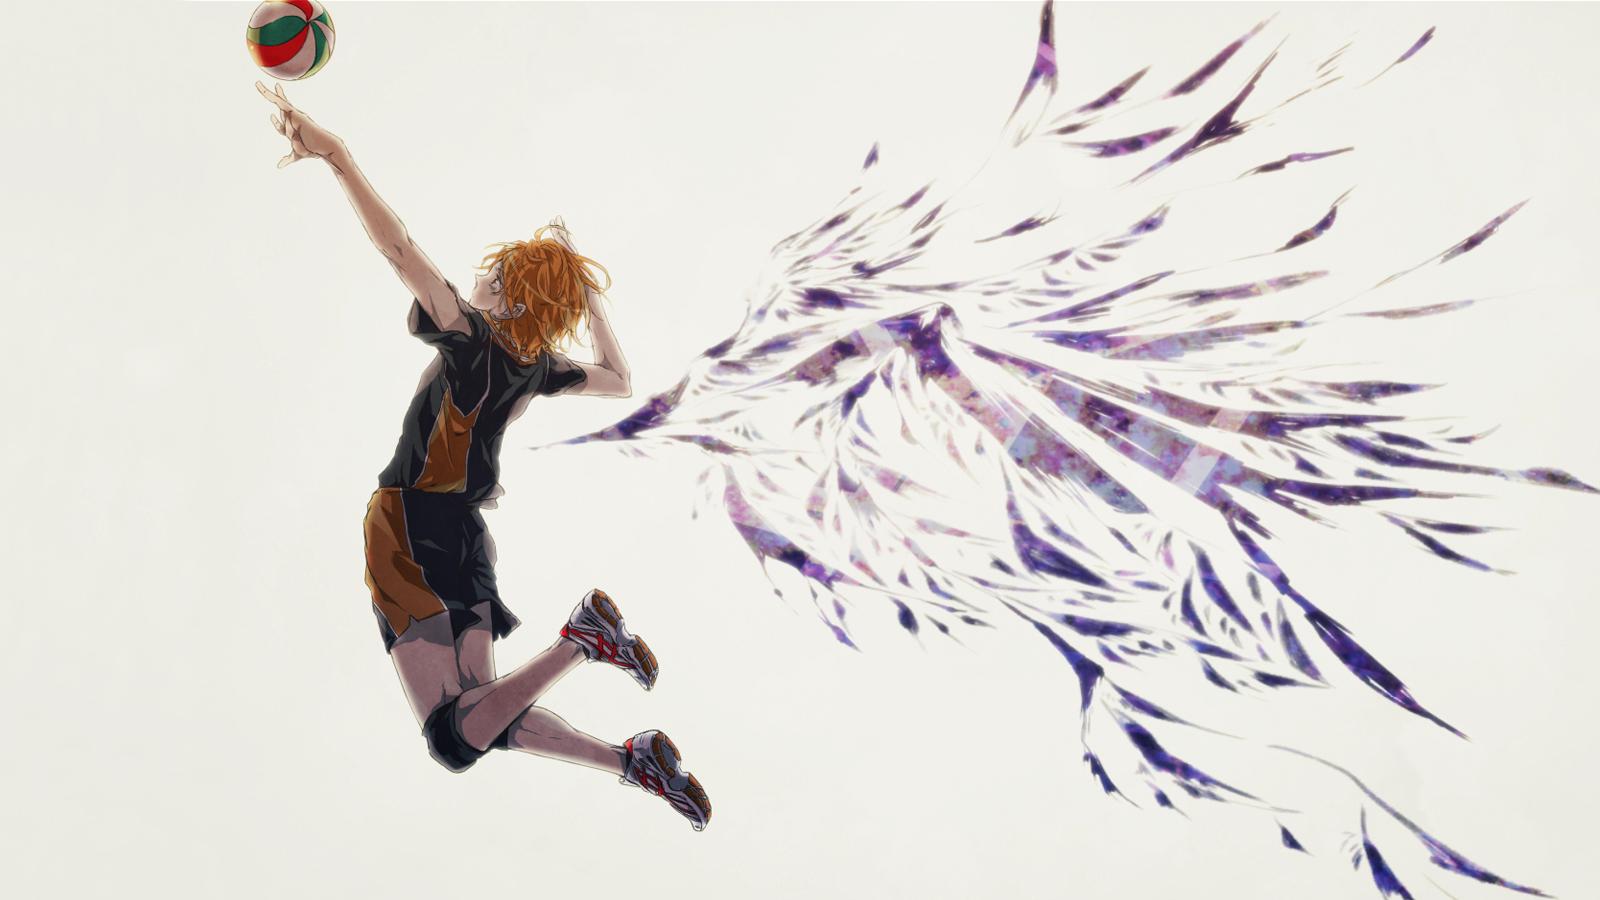 Shouyou Hinata Spike 17 Wallpaper HD